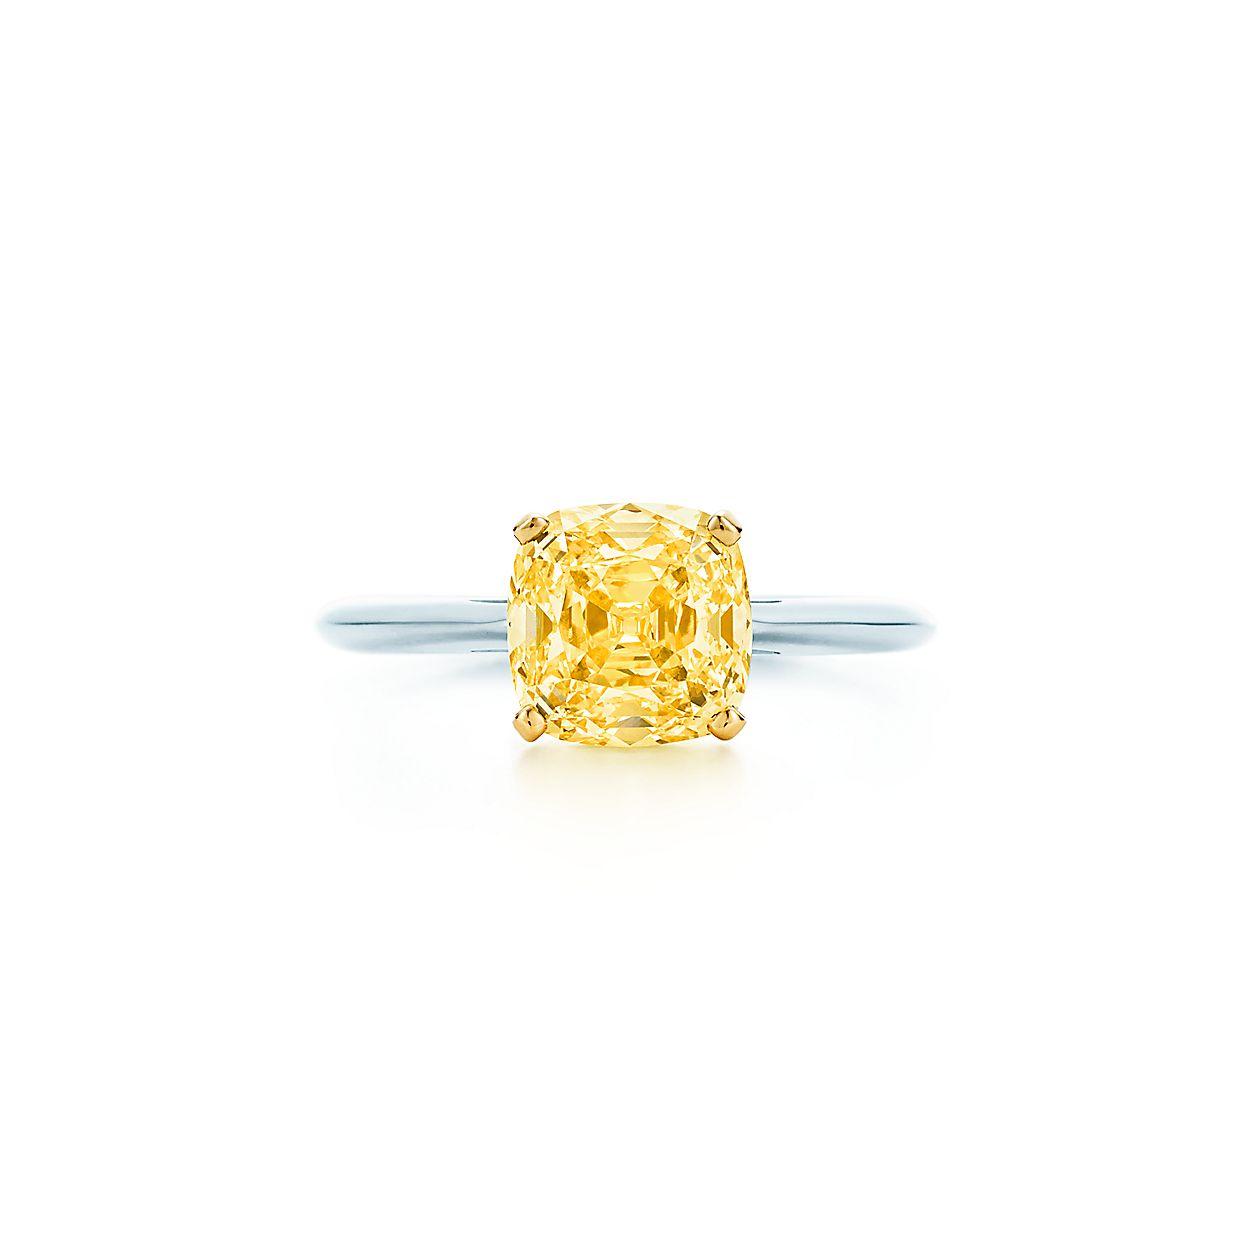 7b0cc65d5c0b3 Classic Single Yellow Diamond Ring